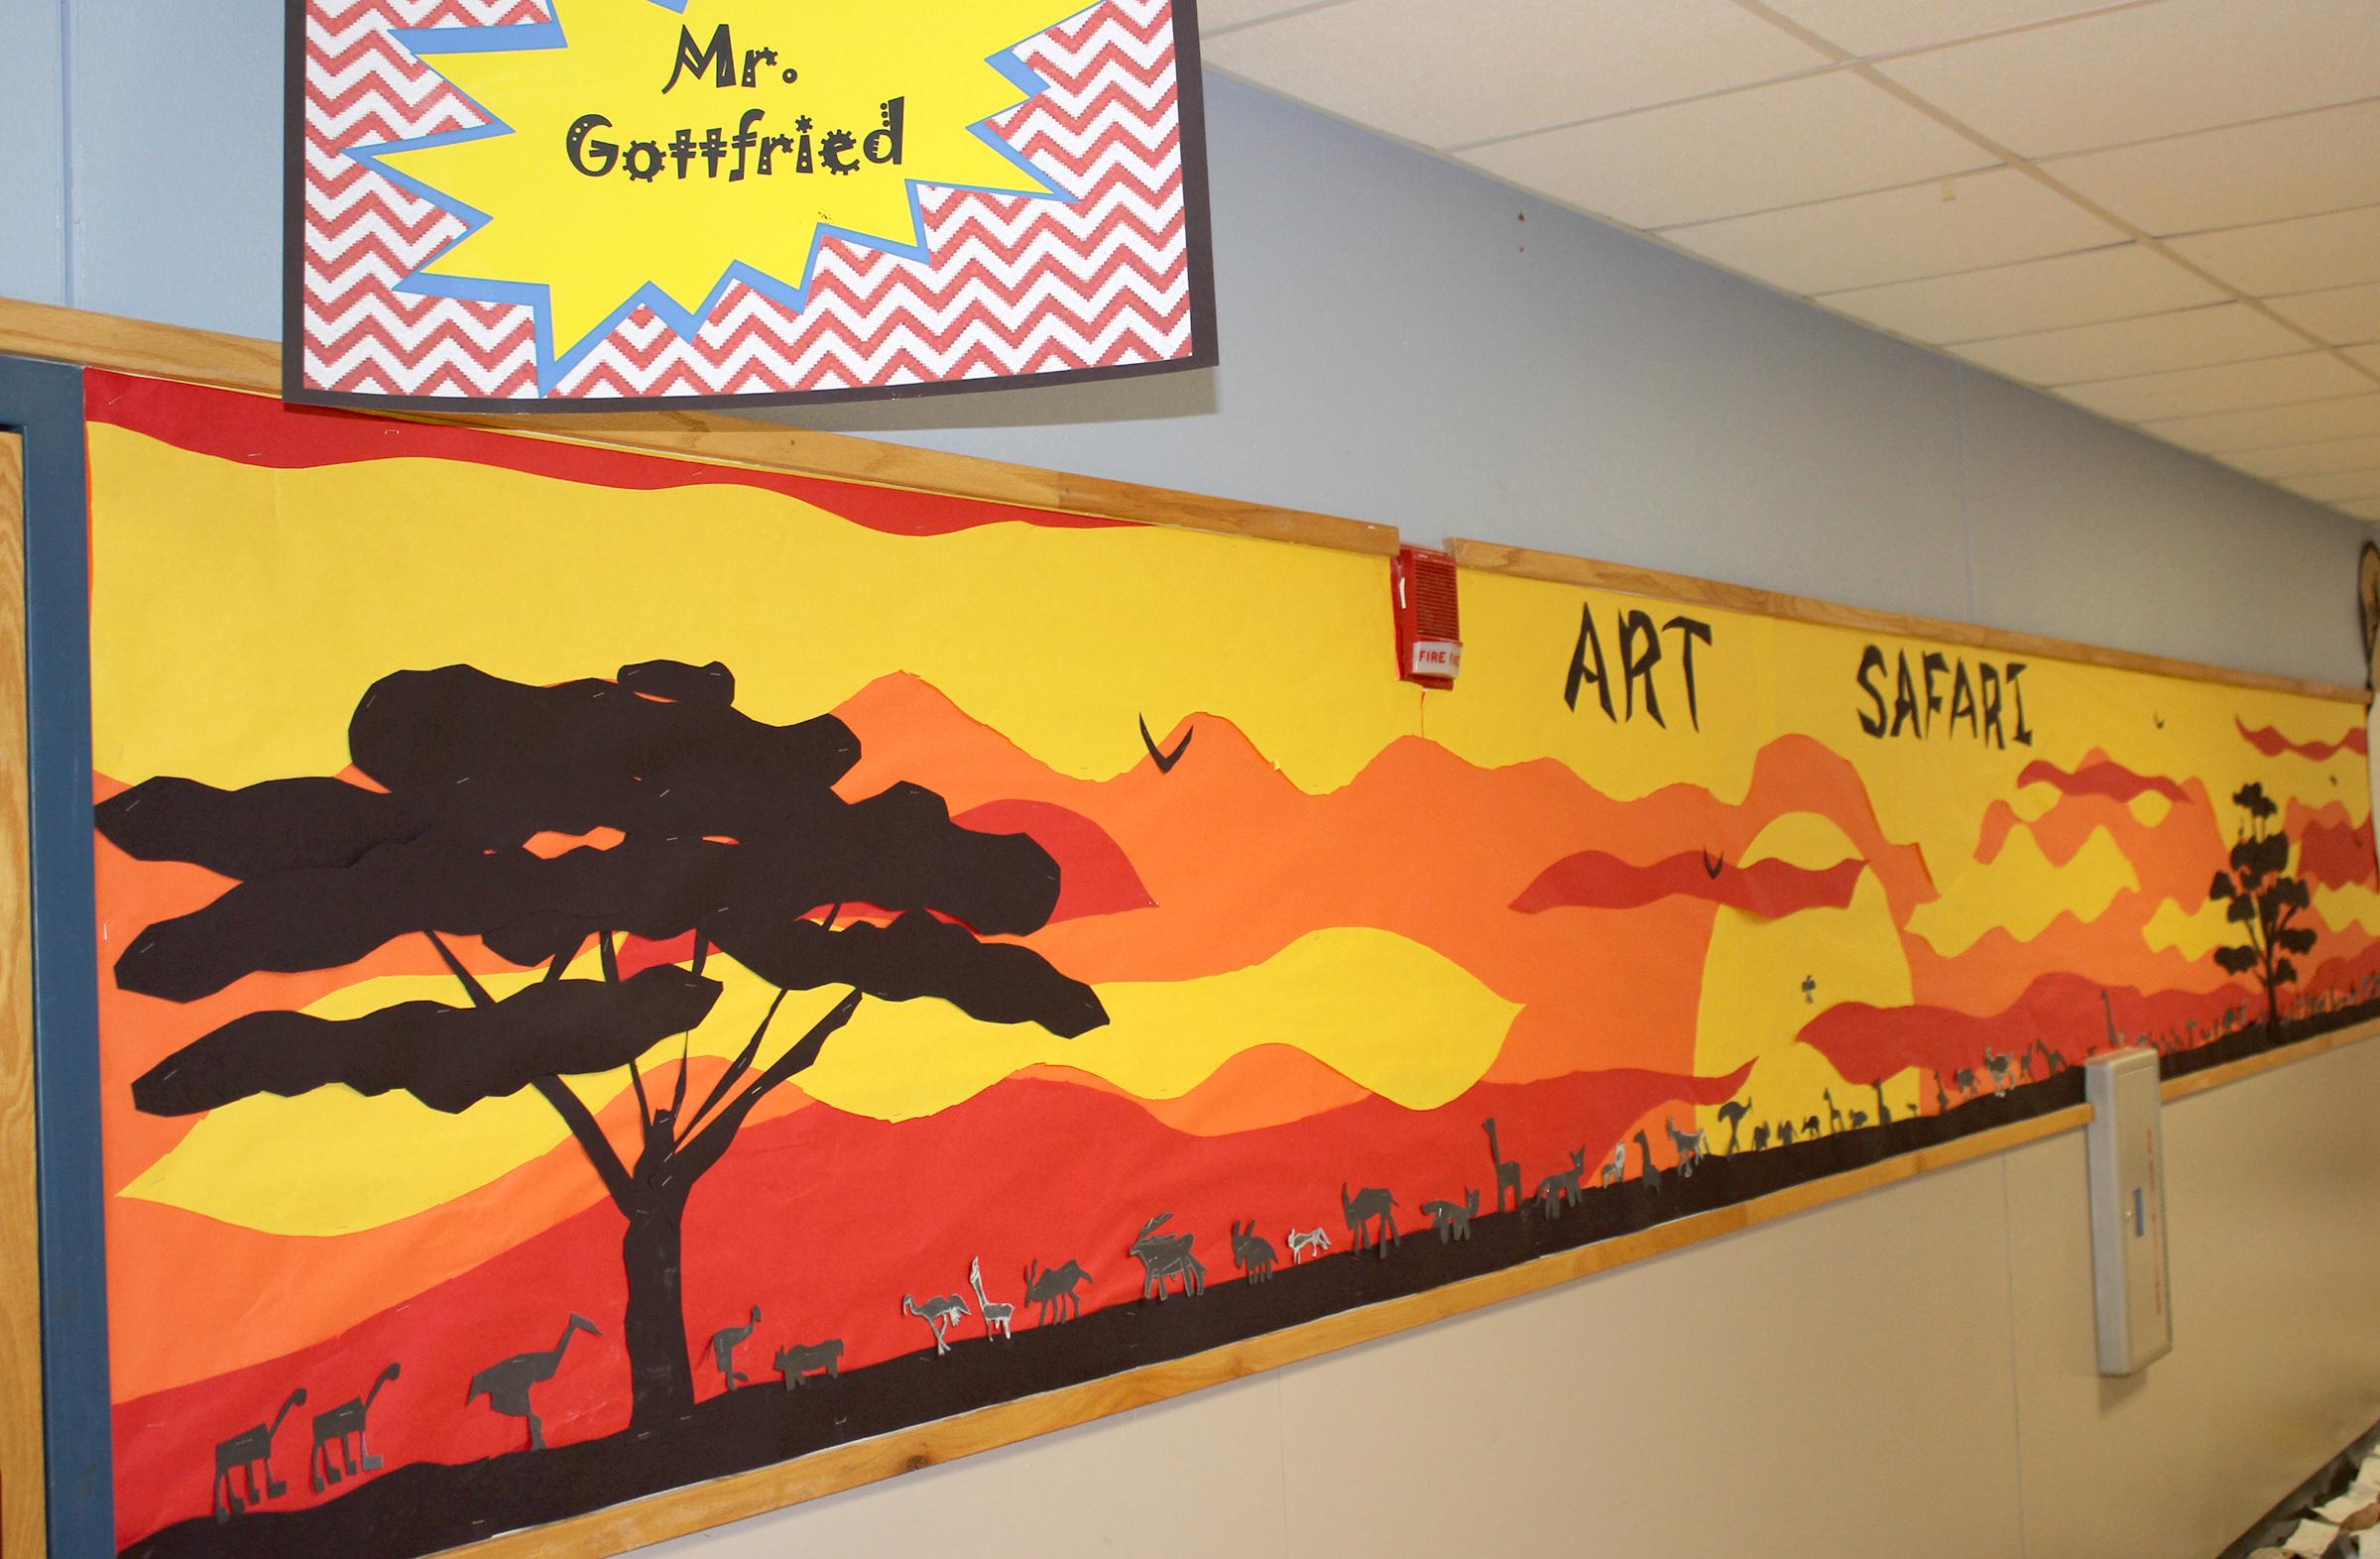 Art safari wall